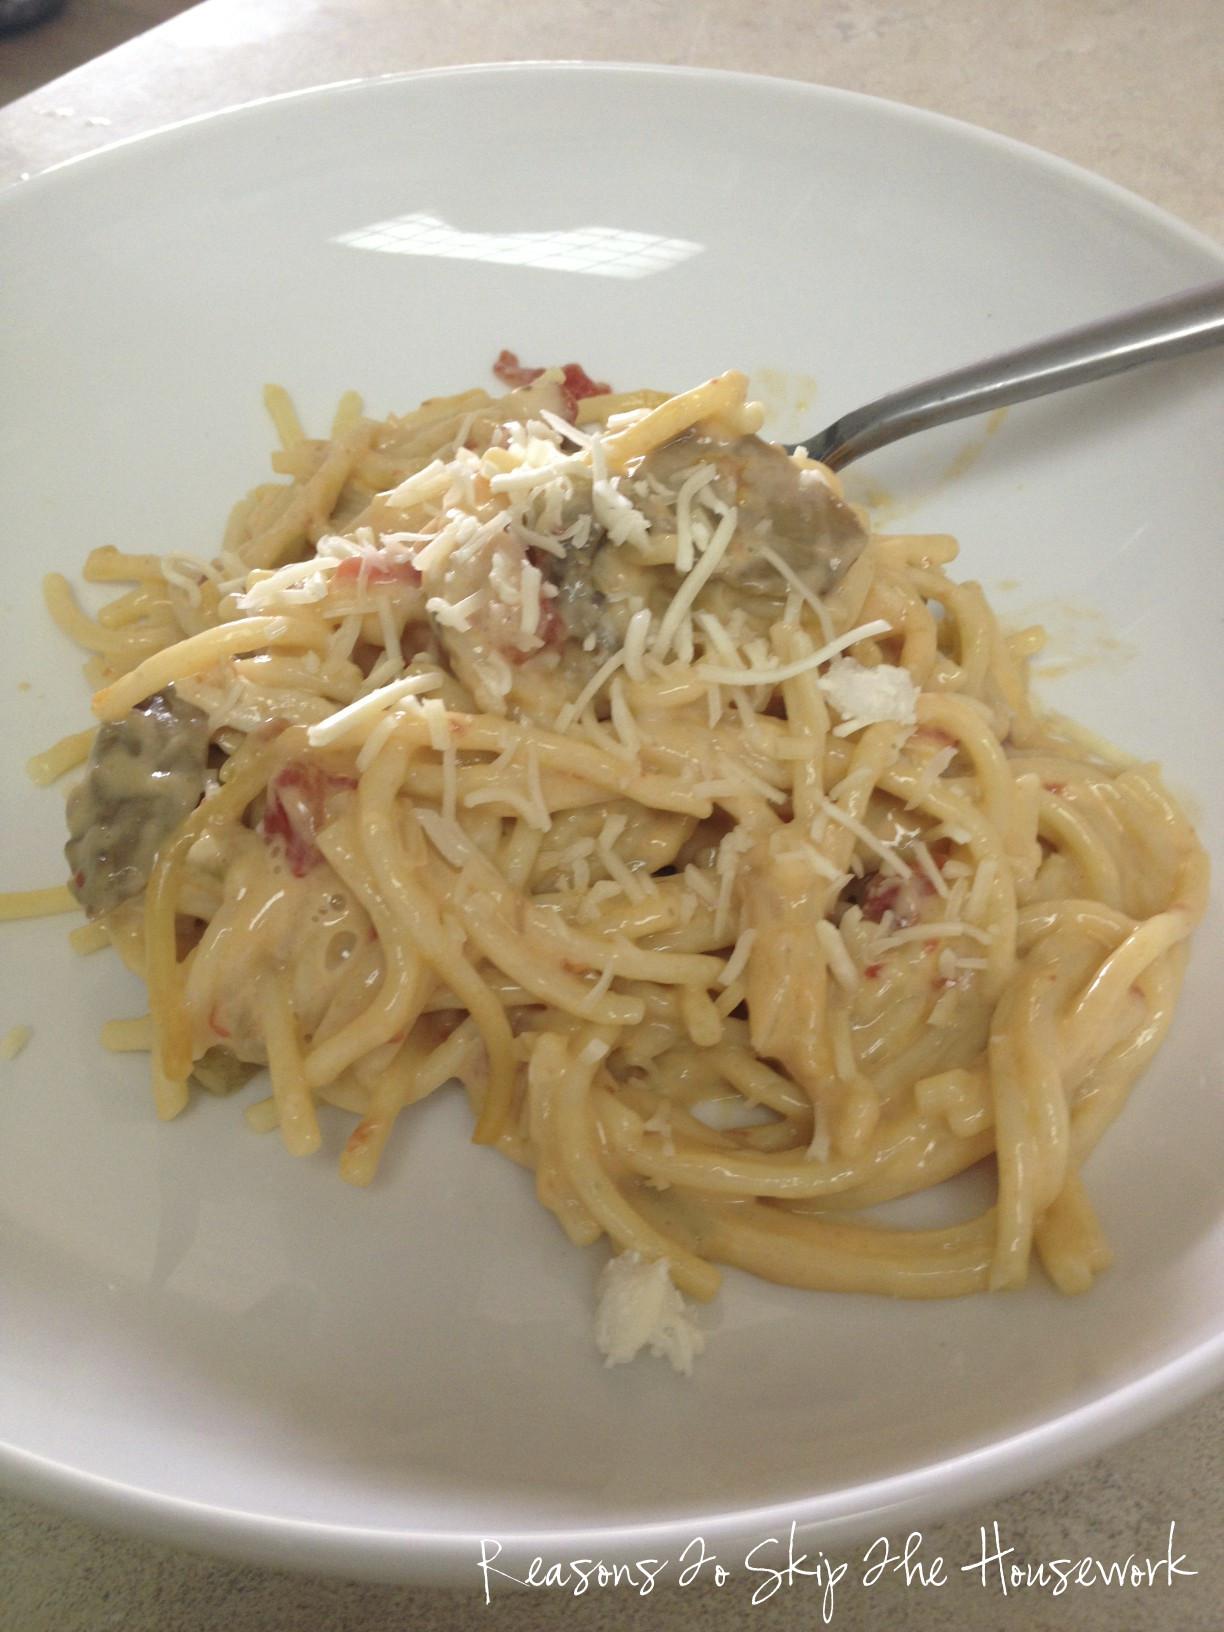 Crockpot Chicken Spaghetti  Crockpot Chicken Spaghetti with Velveeta Skip The Housework